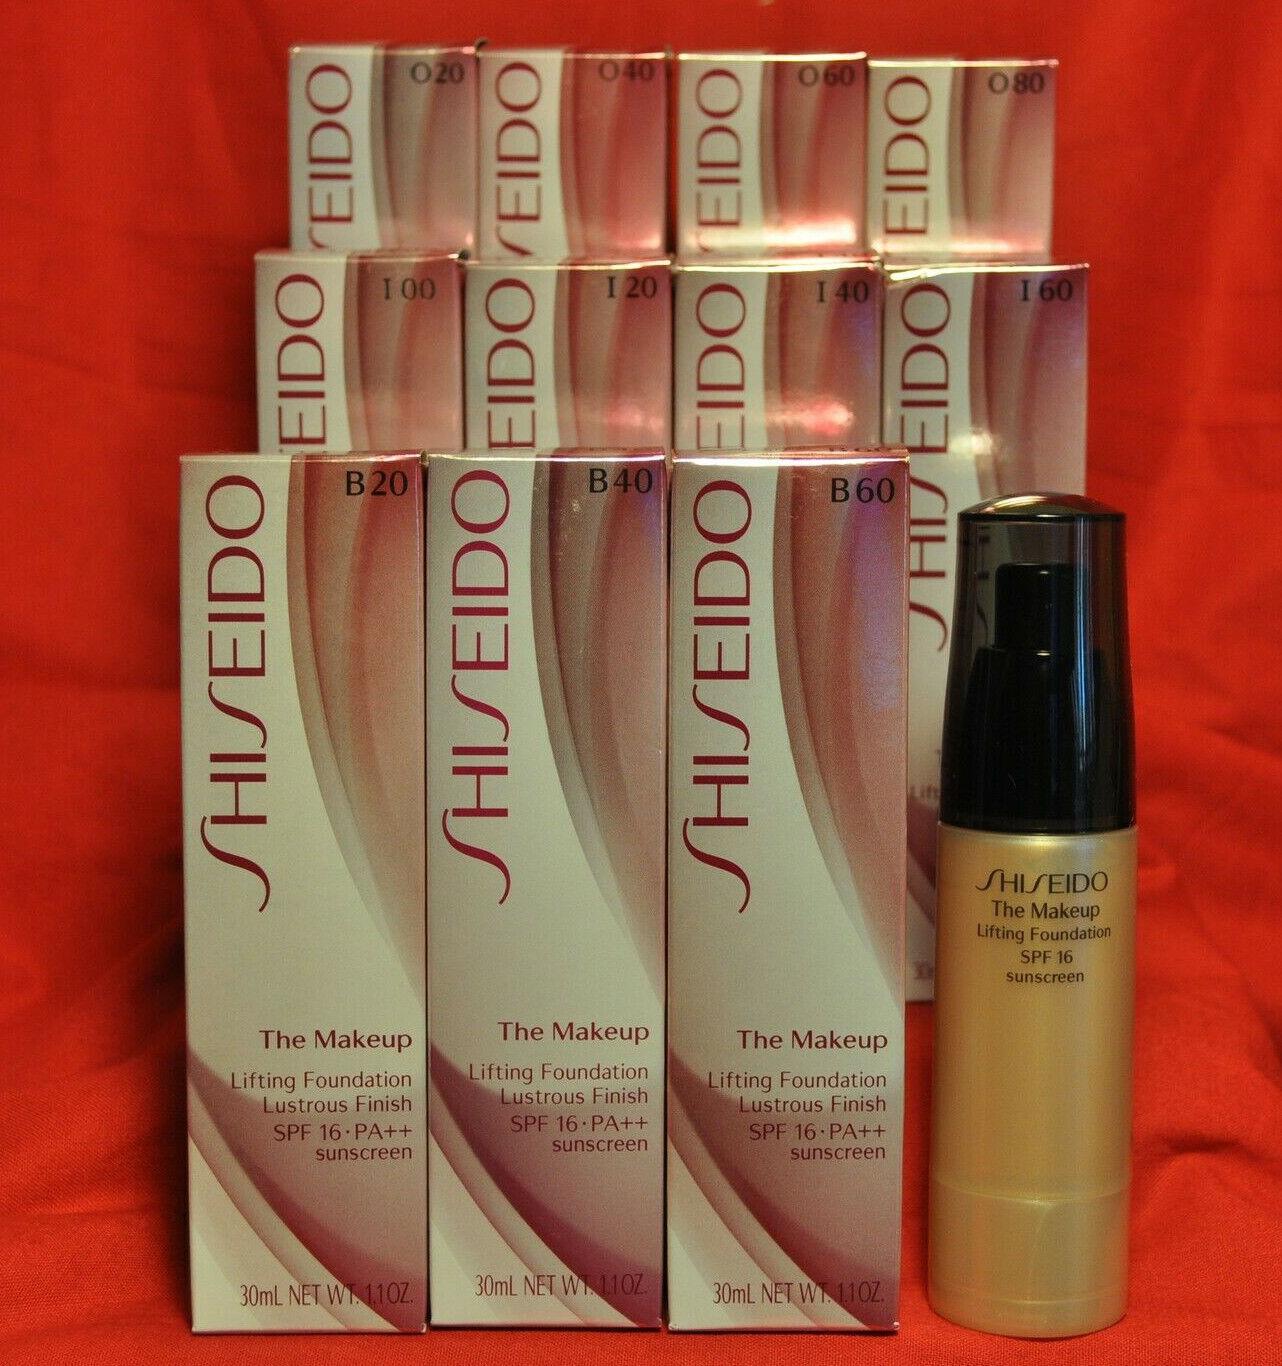 Shiseido Makeup Spf 15 Refining Foundation O40 Natural Fair Ochre Primer For Sale Online Ebay